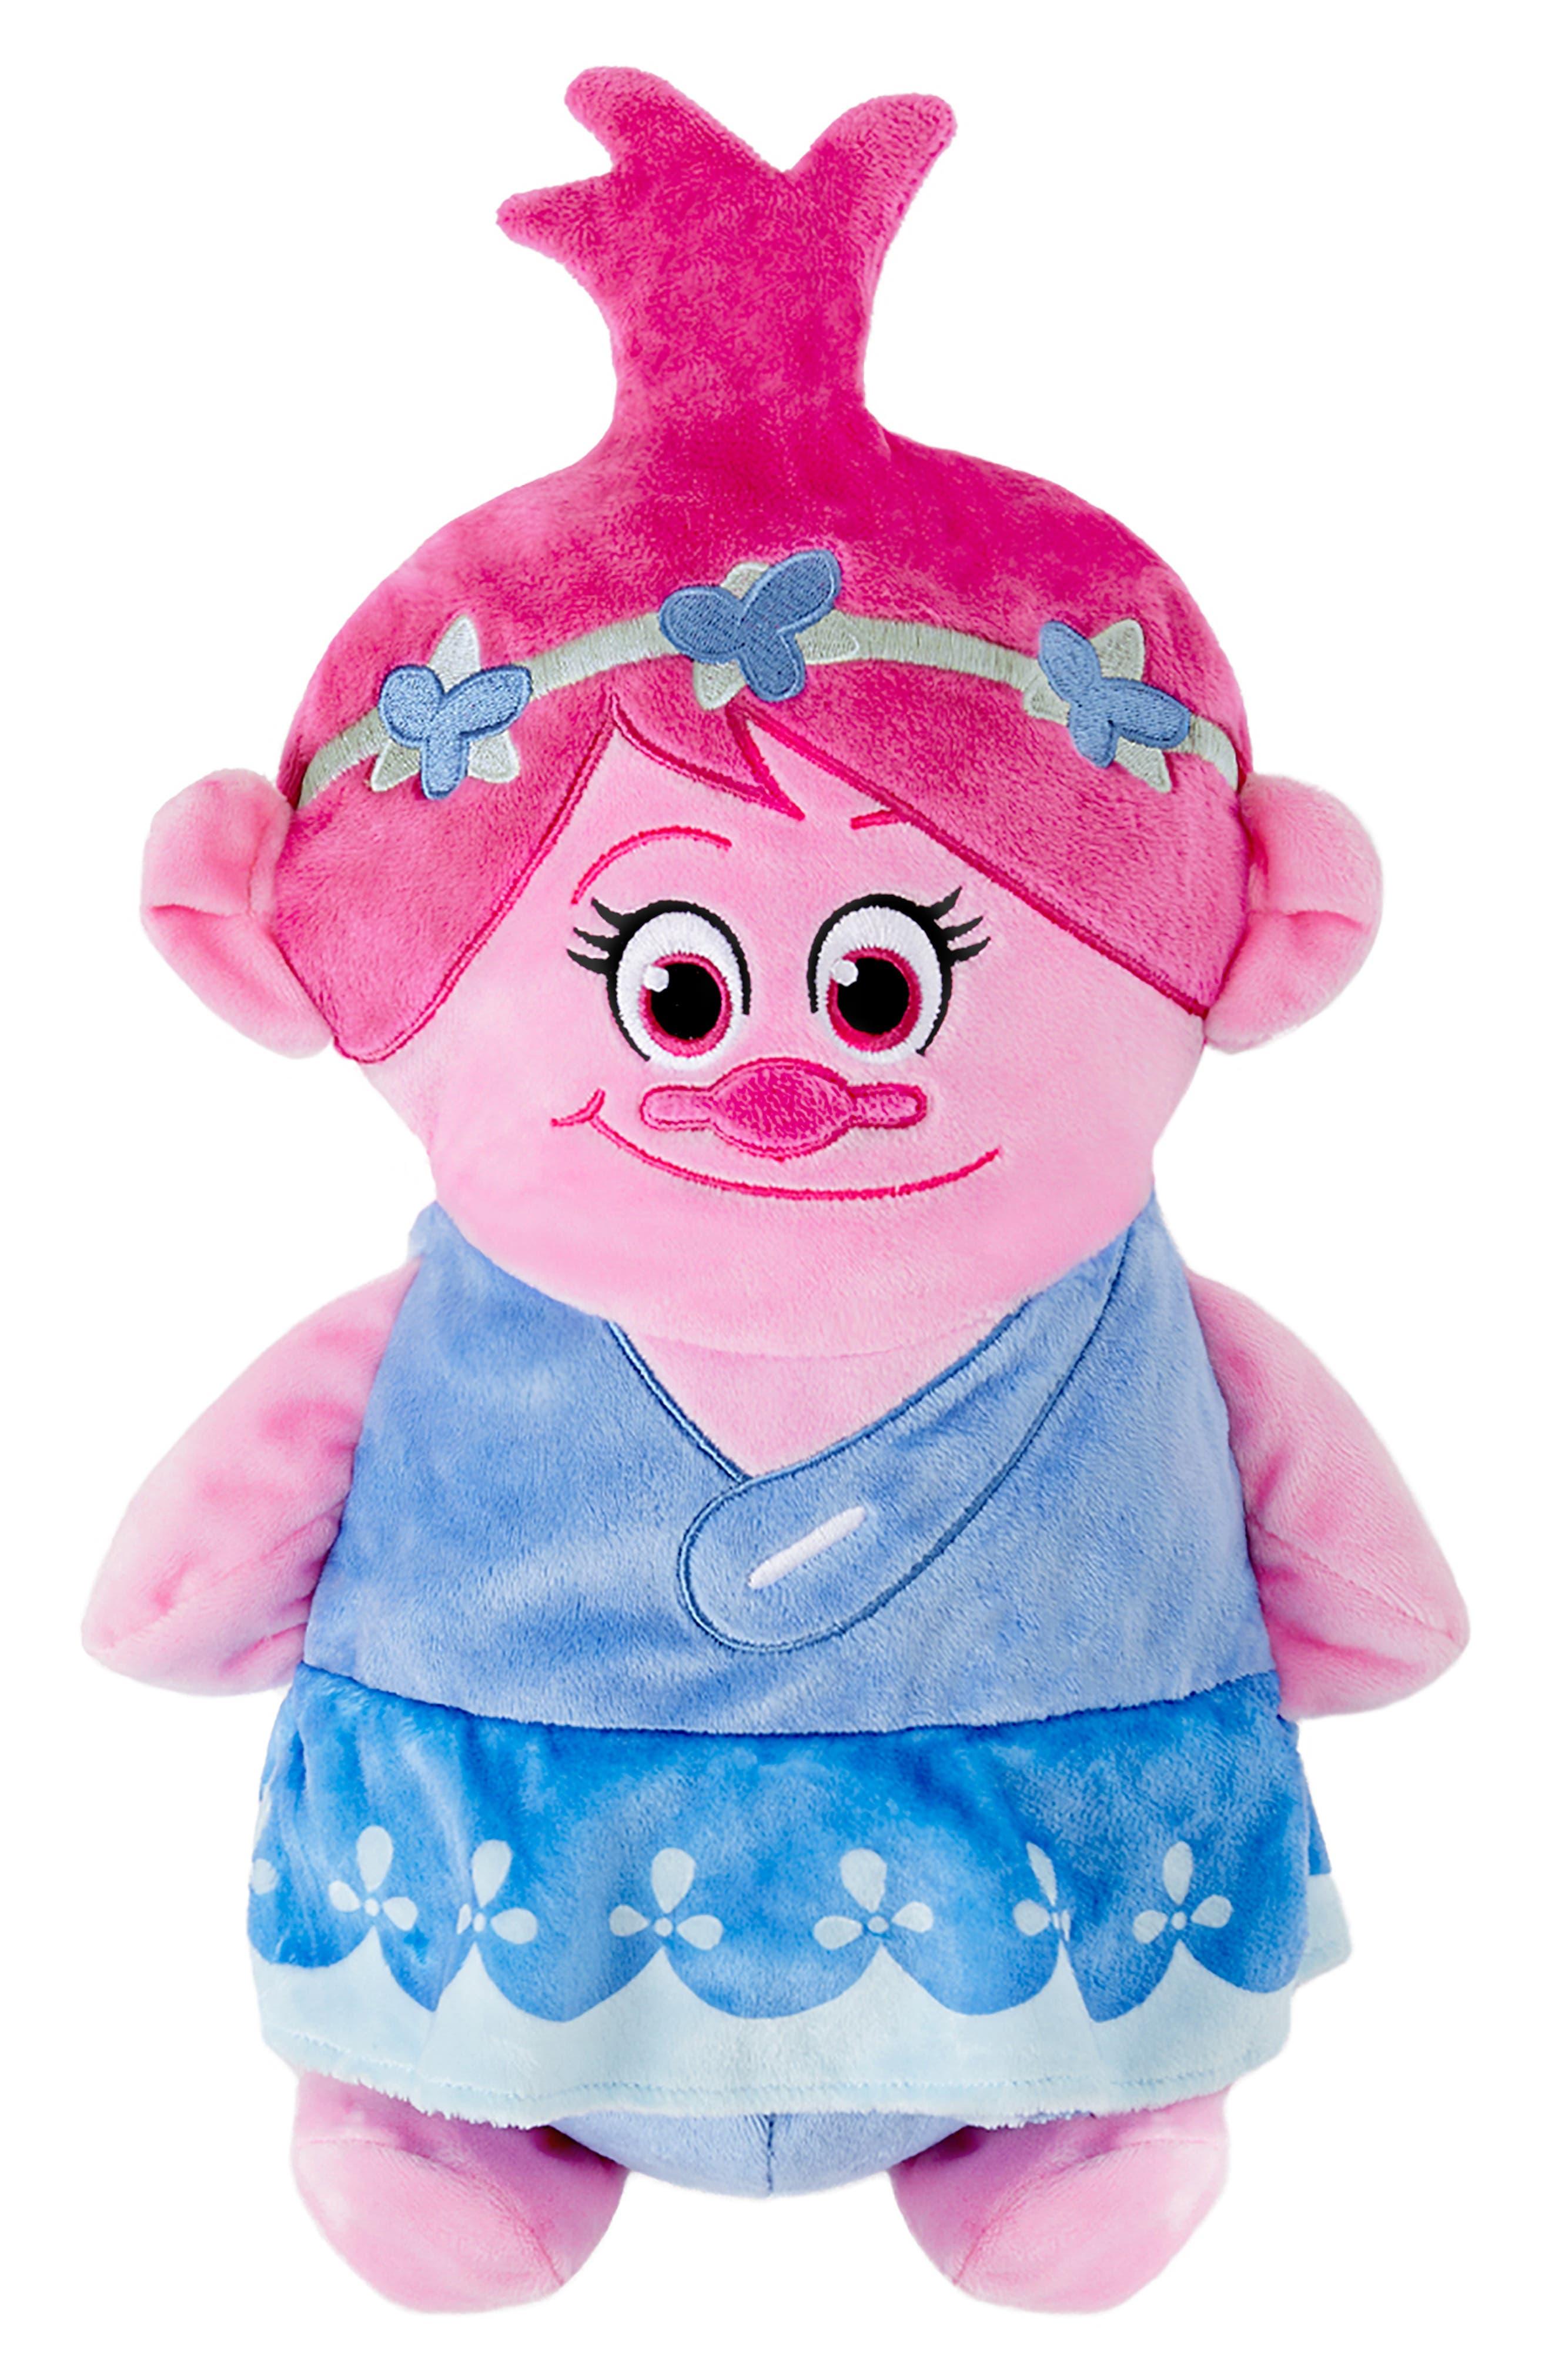 DreamWorks Trolls Poppy 2-in-1 Stuffed Animal Hoodie,                             Main thumbnail 1, color,                             PINK MIX